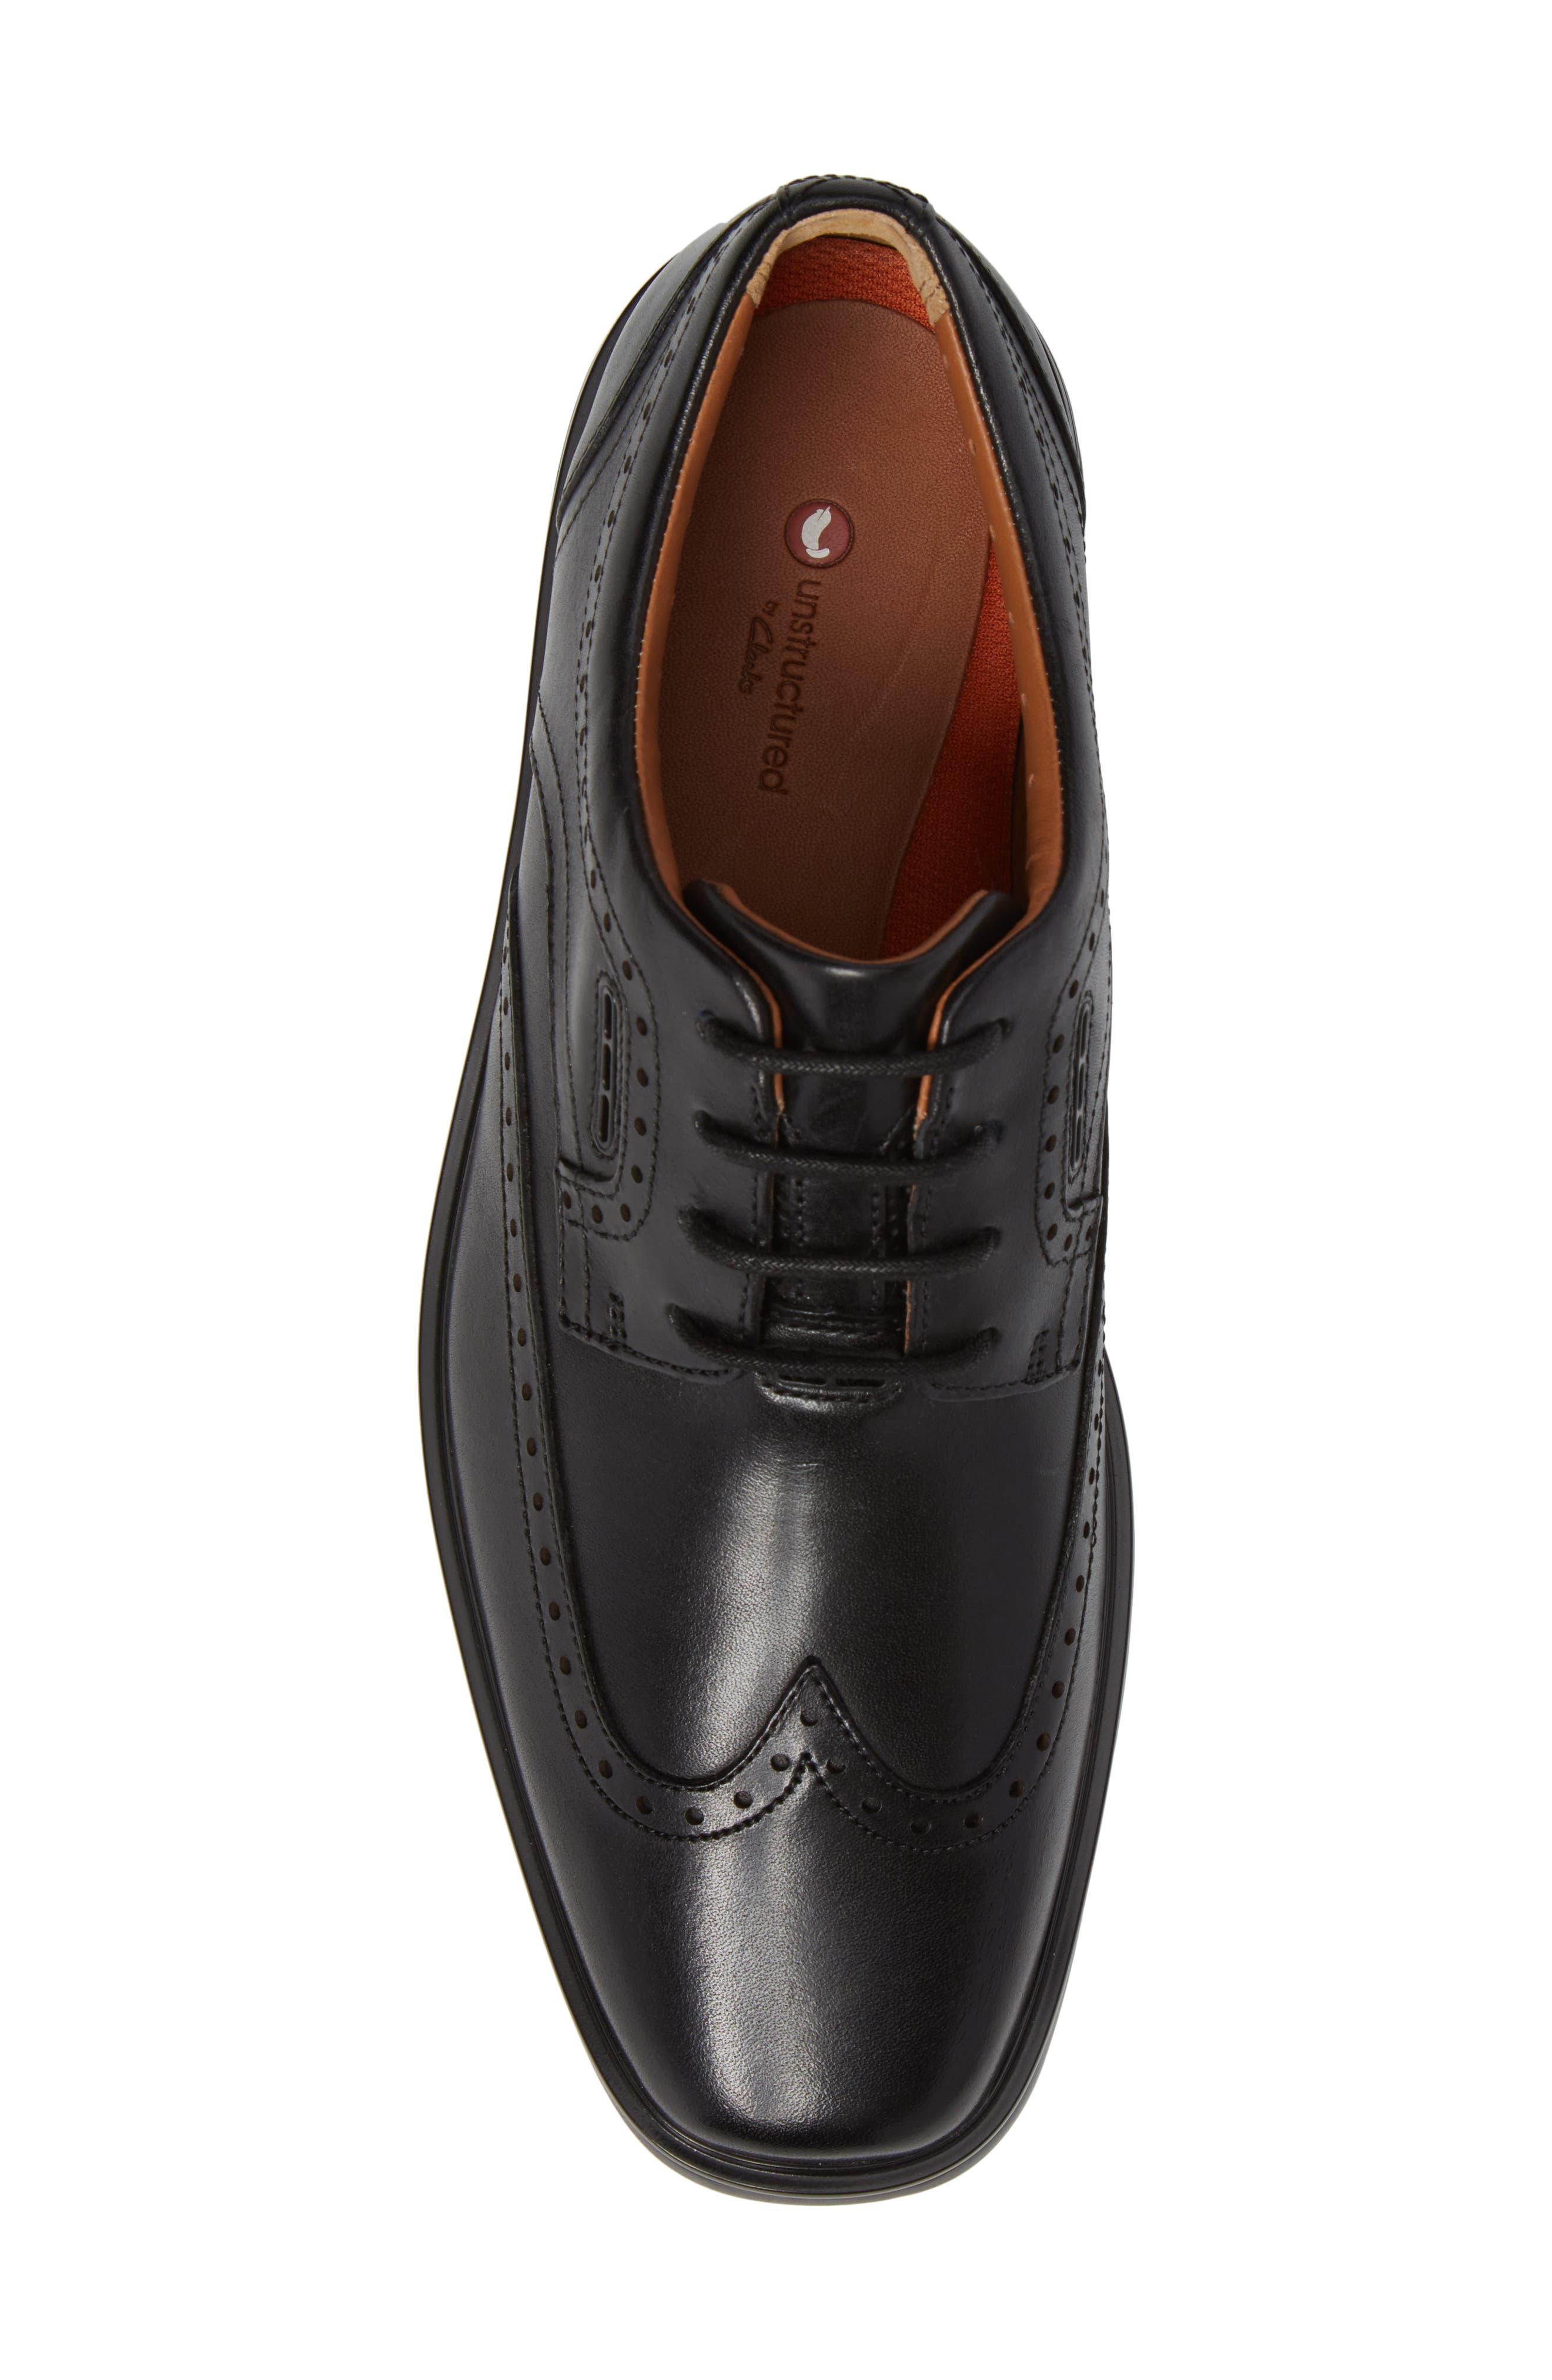 Unbrylan Wingtip Oxford,                             Alternate thumbnail 5, color,                             Black Leather